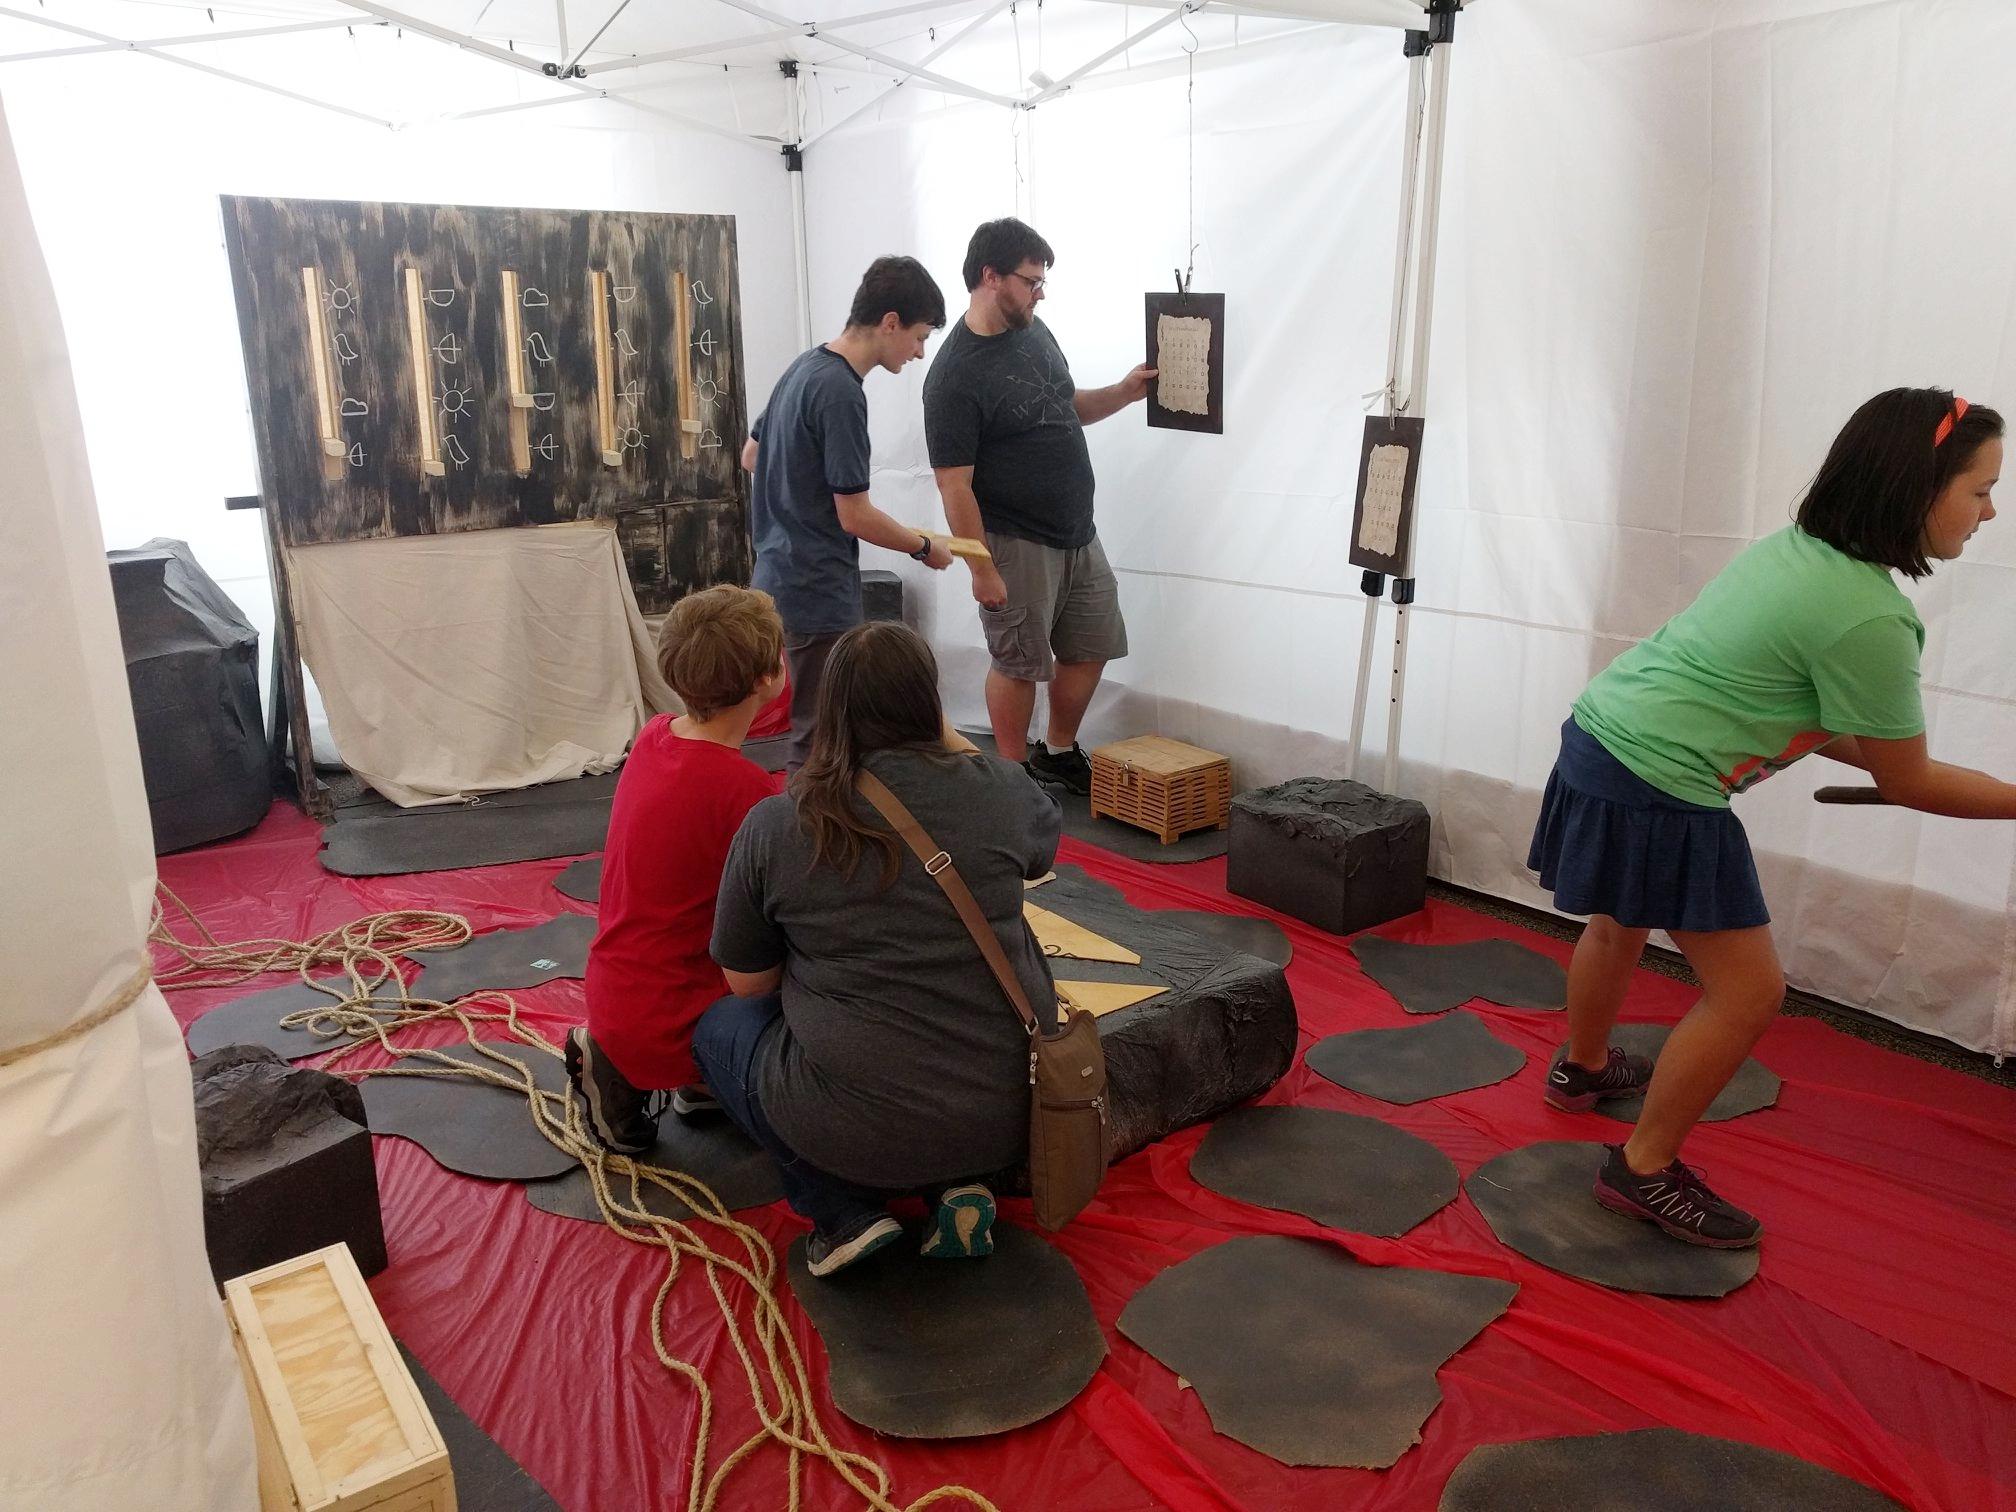 escape rooms Bloomington IN team-building family fun